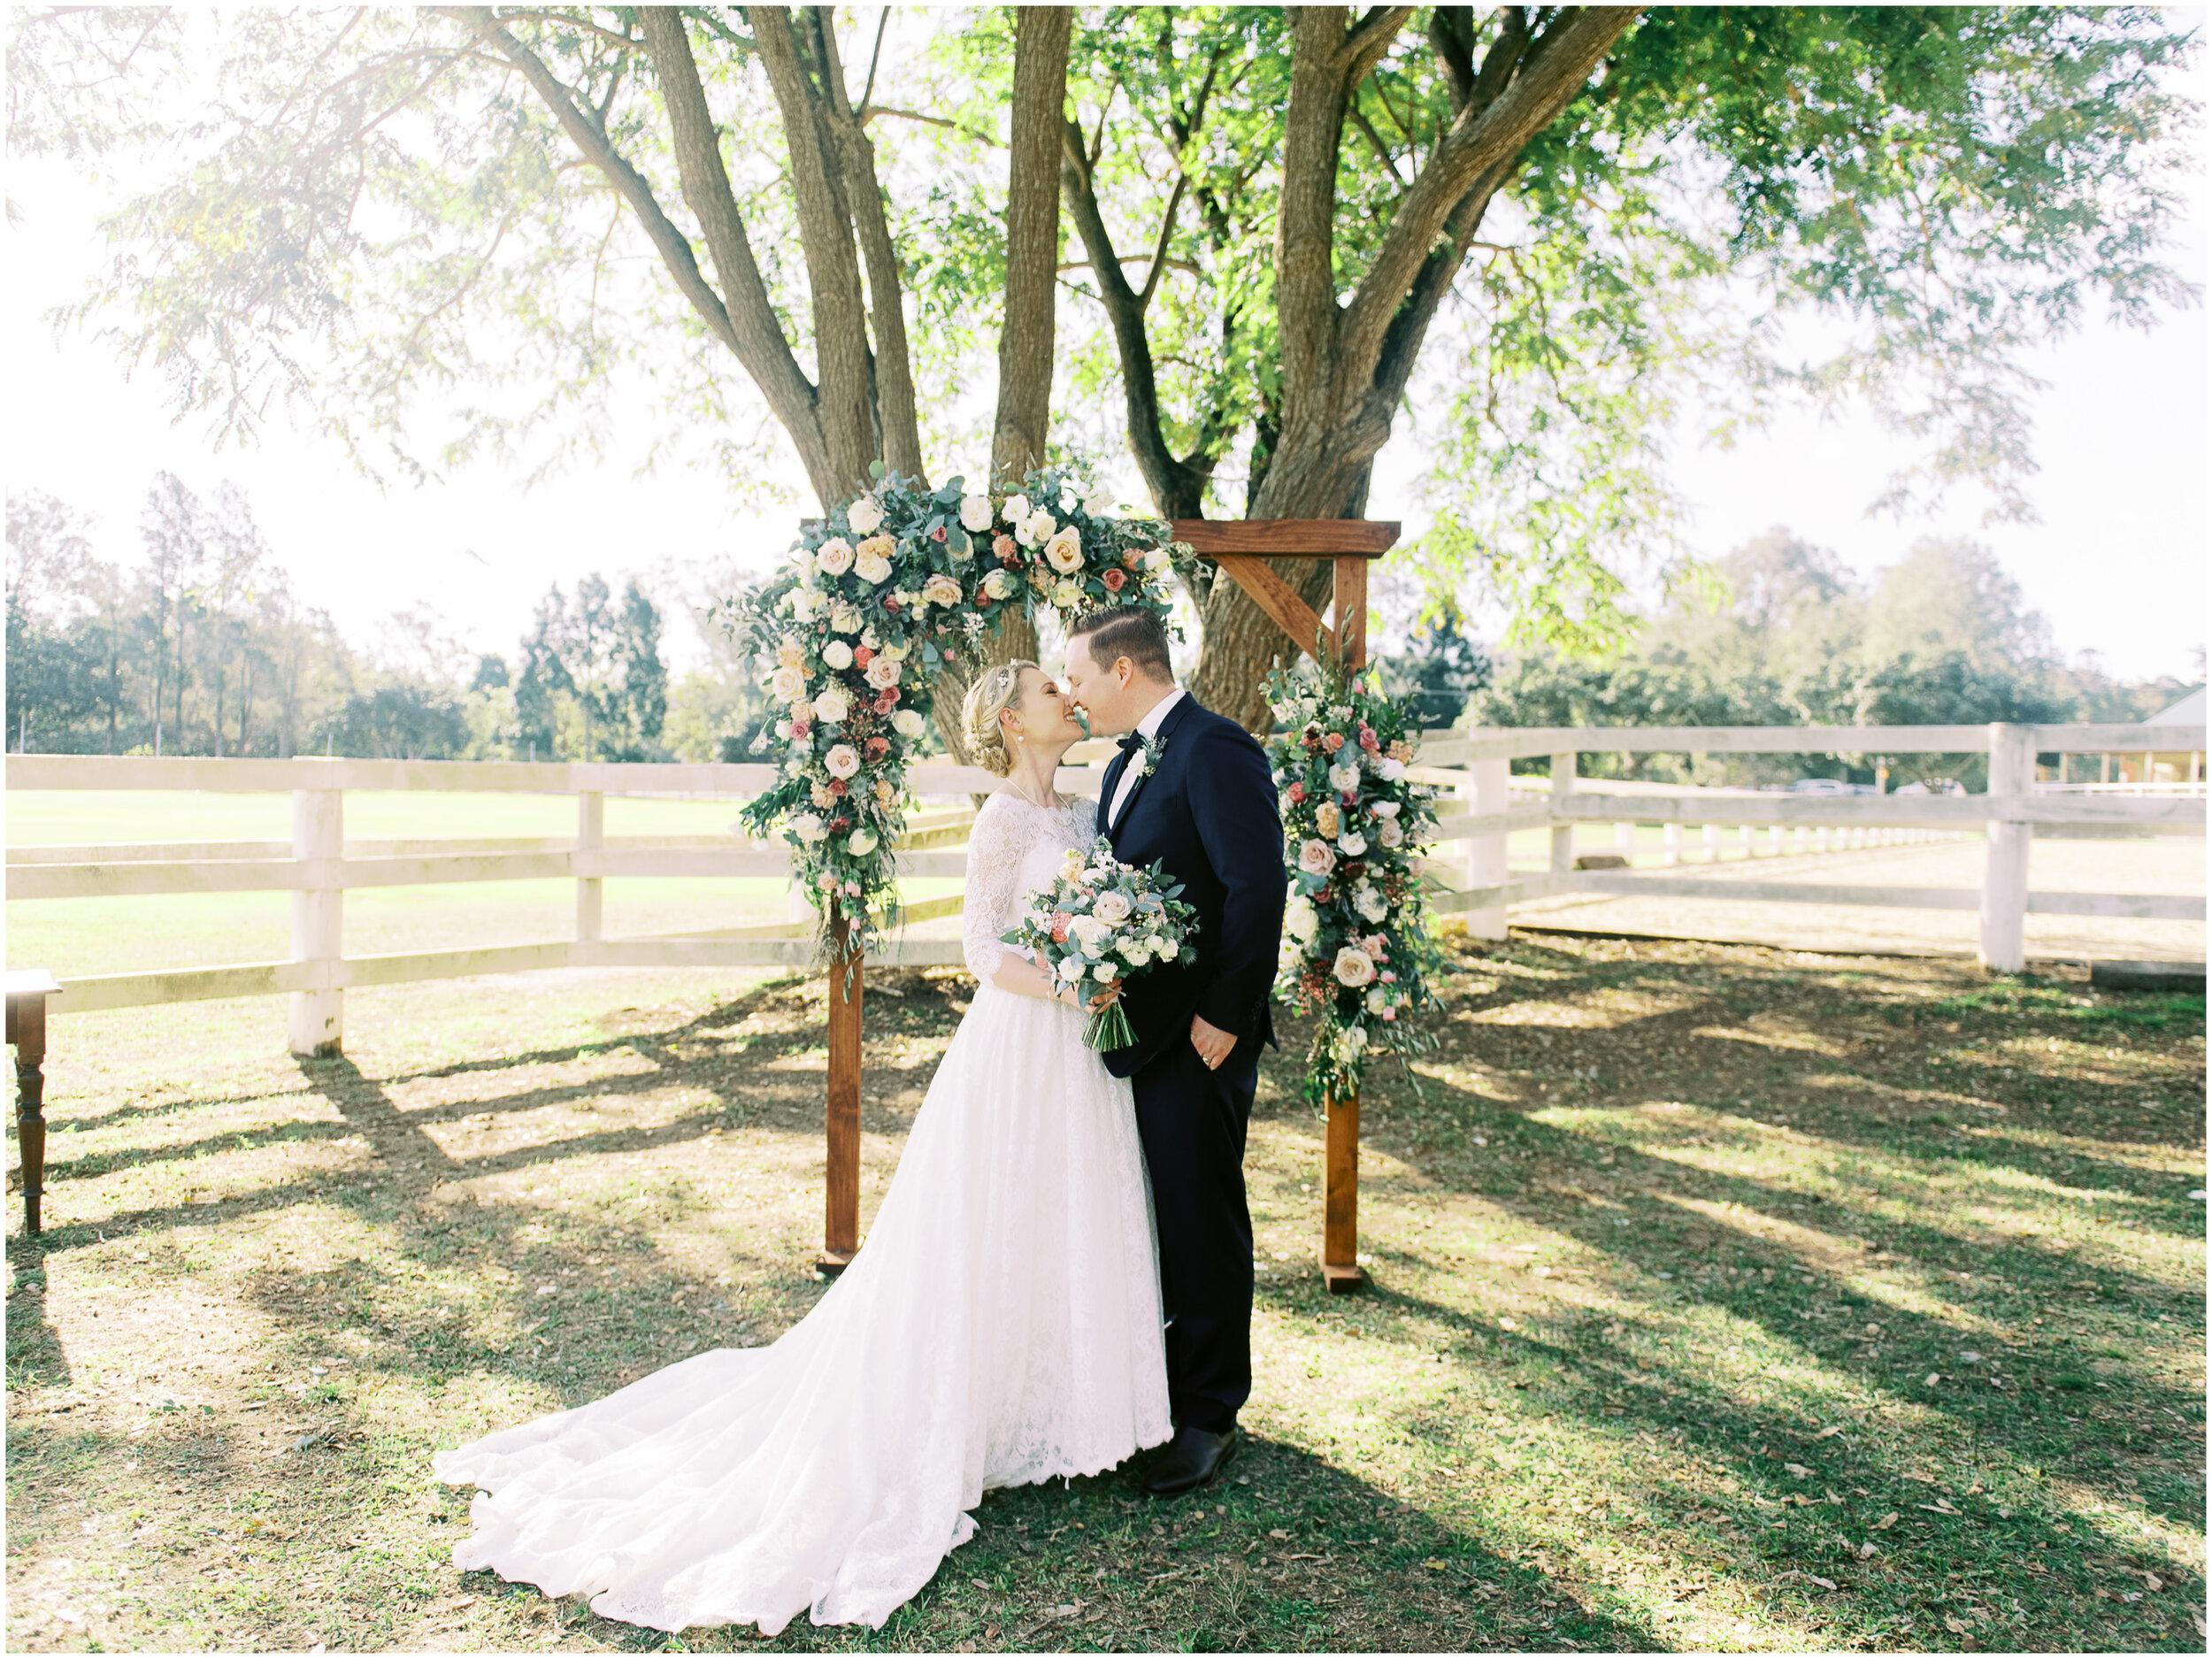 brisbane-film-wedding-photographer-lauren-olivia-luxury-wedding-australia-01-11.jpg